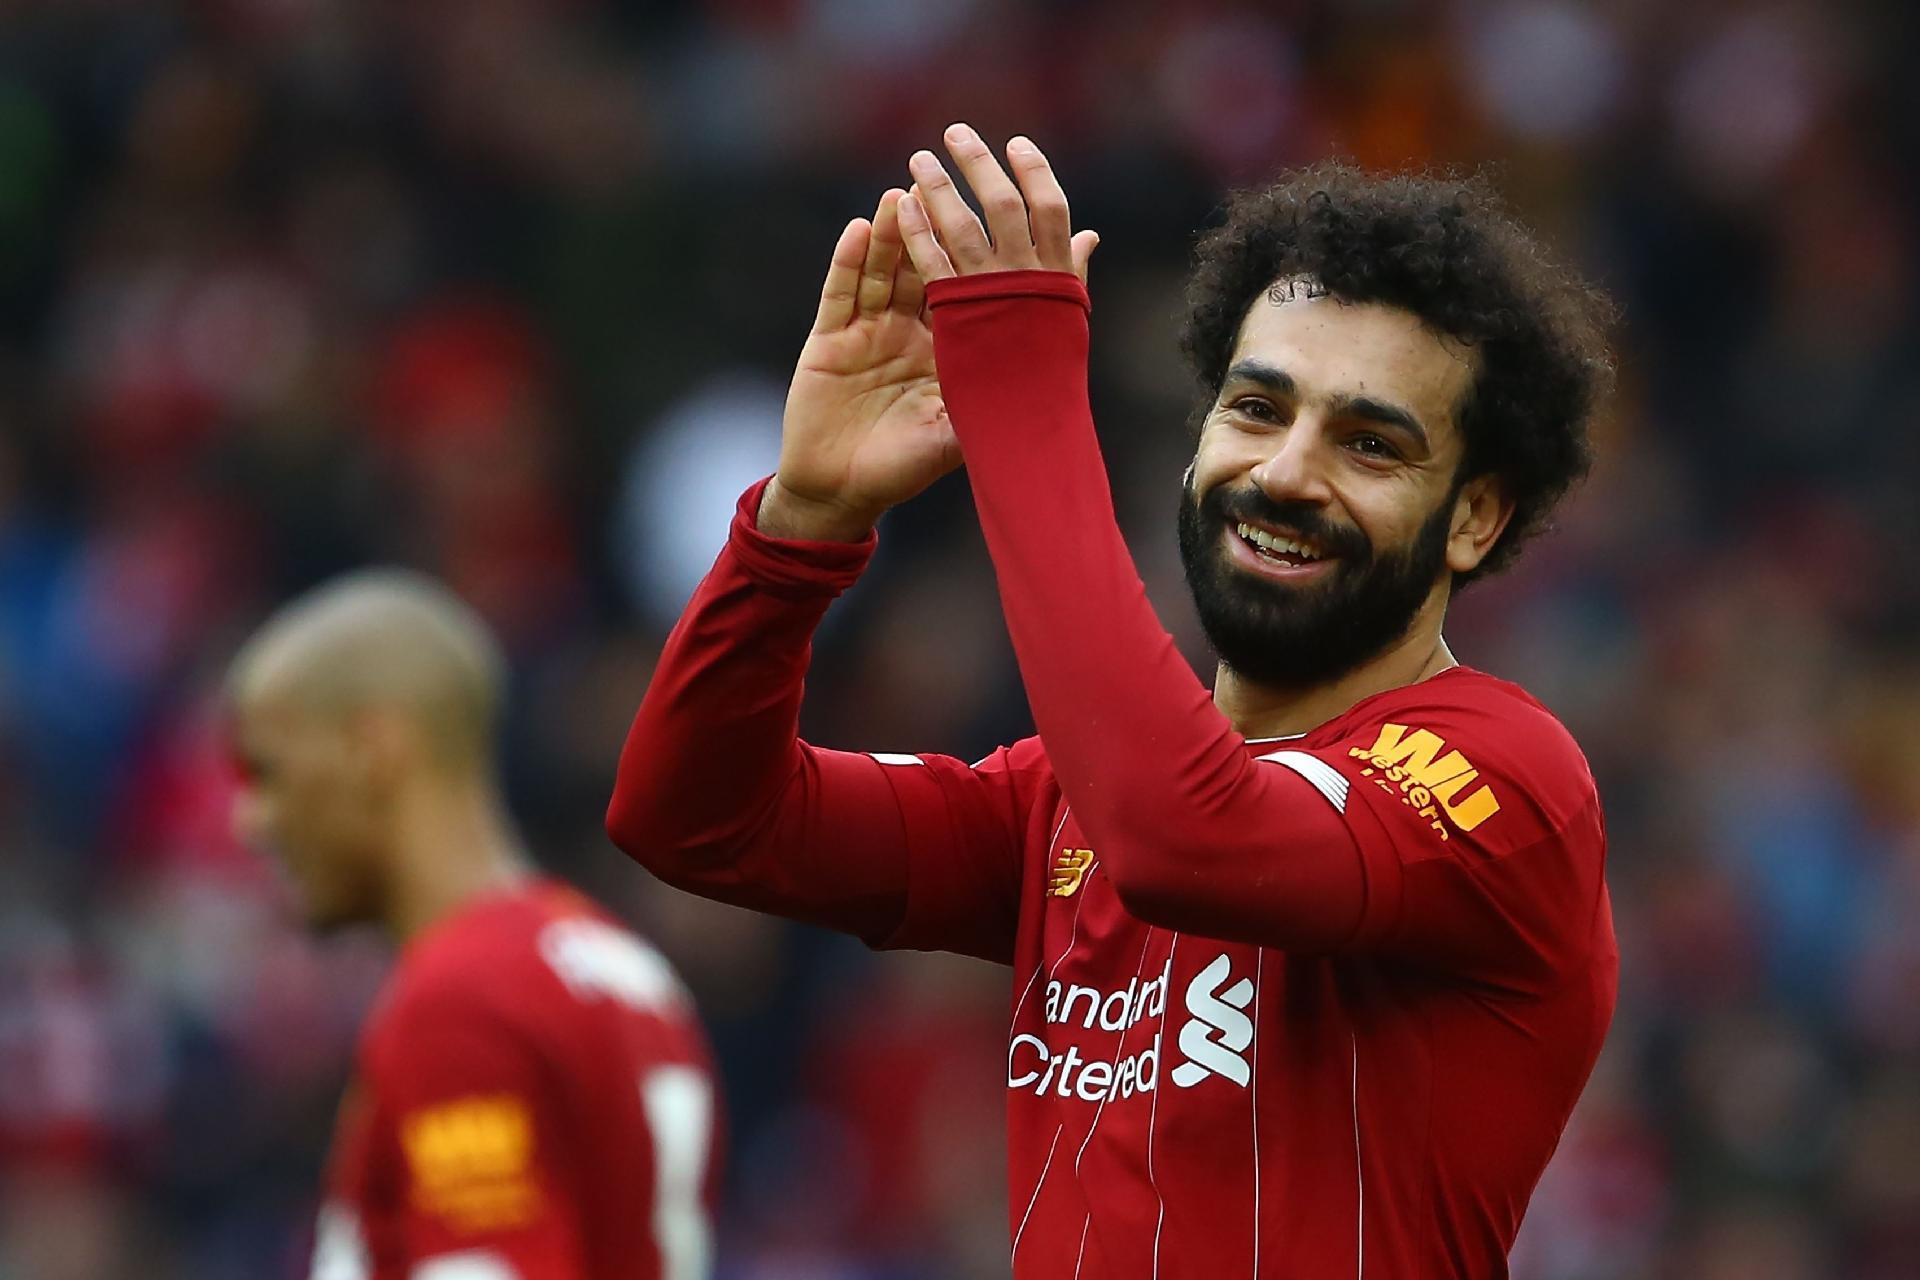 Salah deixa dúvidas sobre futuro no Liverpool e diz querer 'aproveitar o momento'